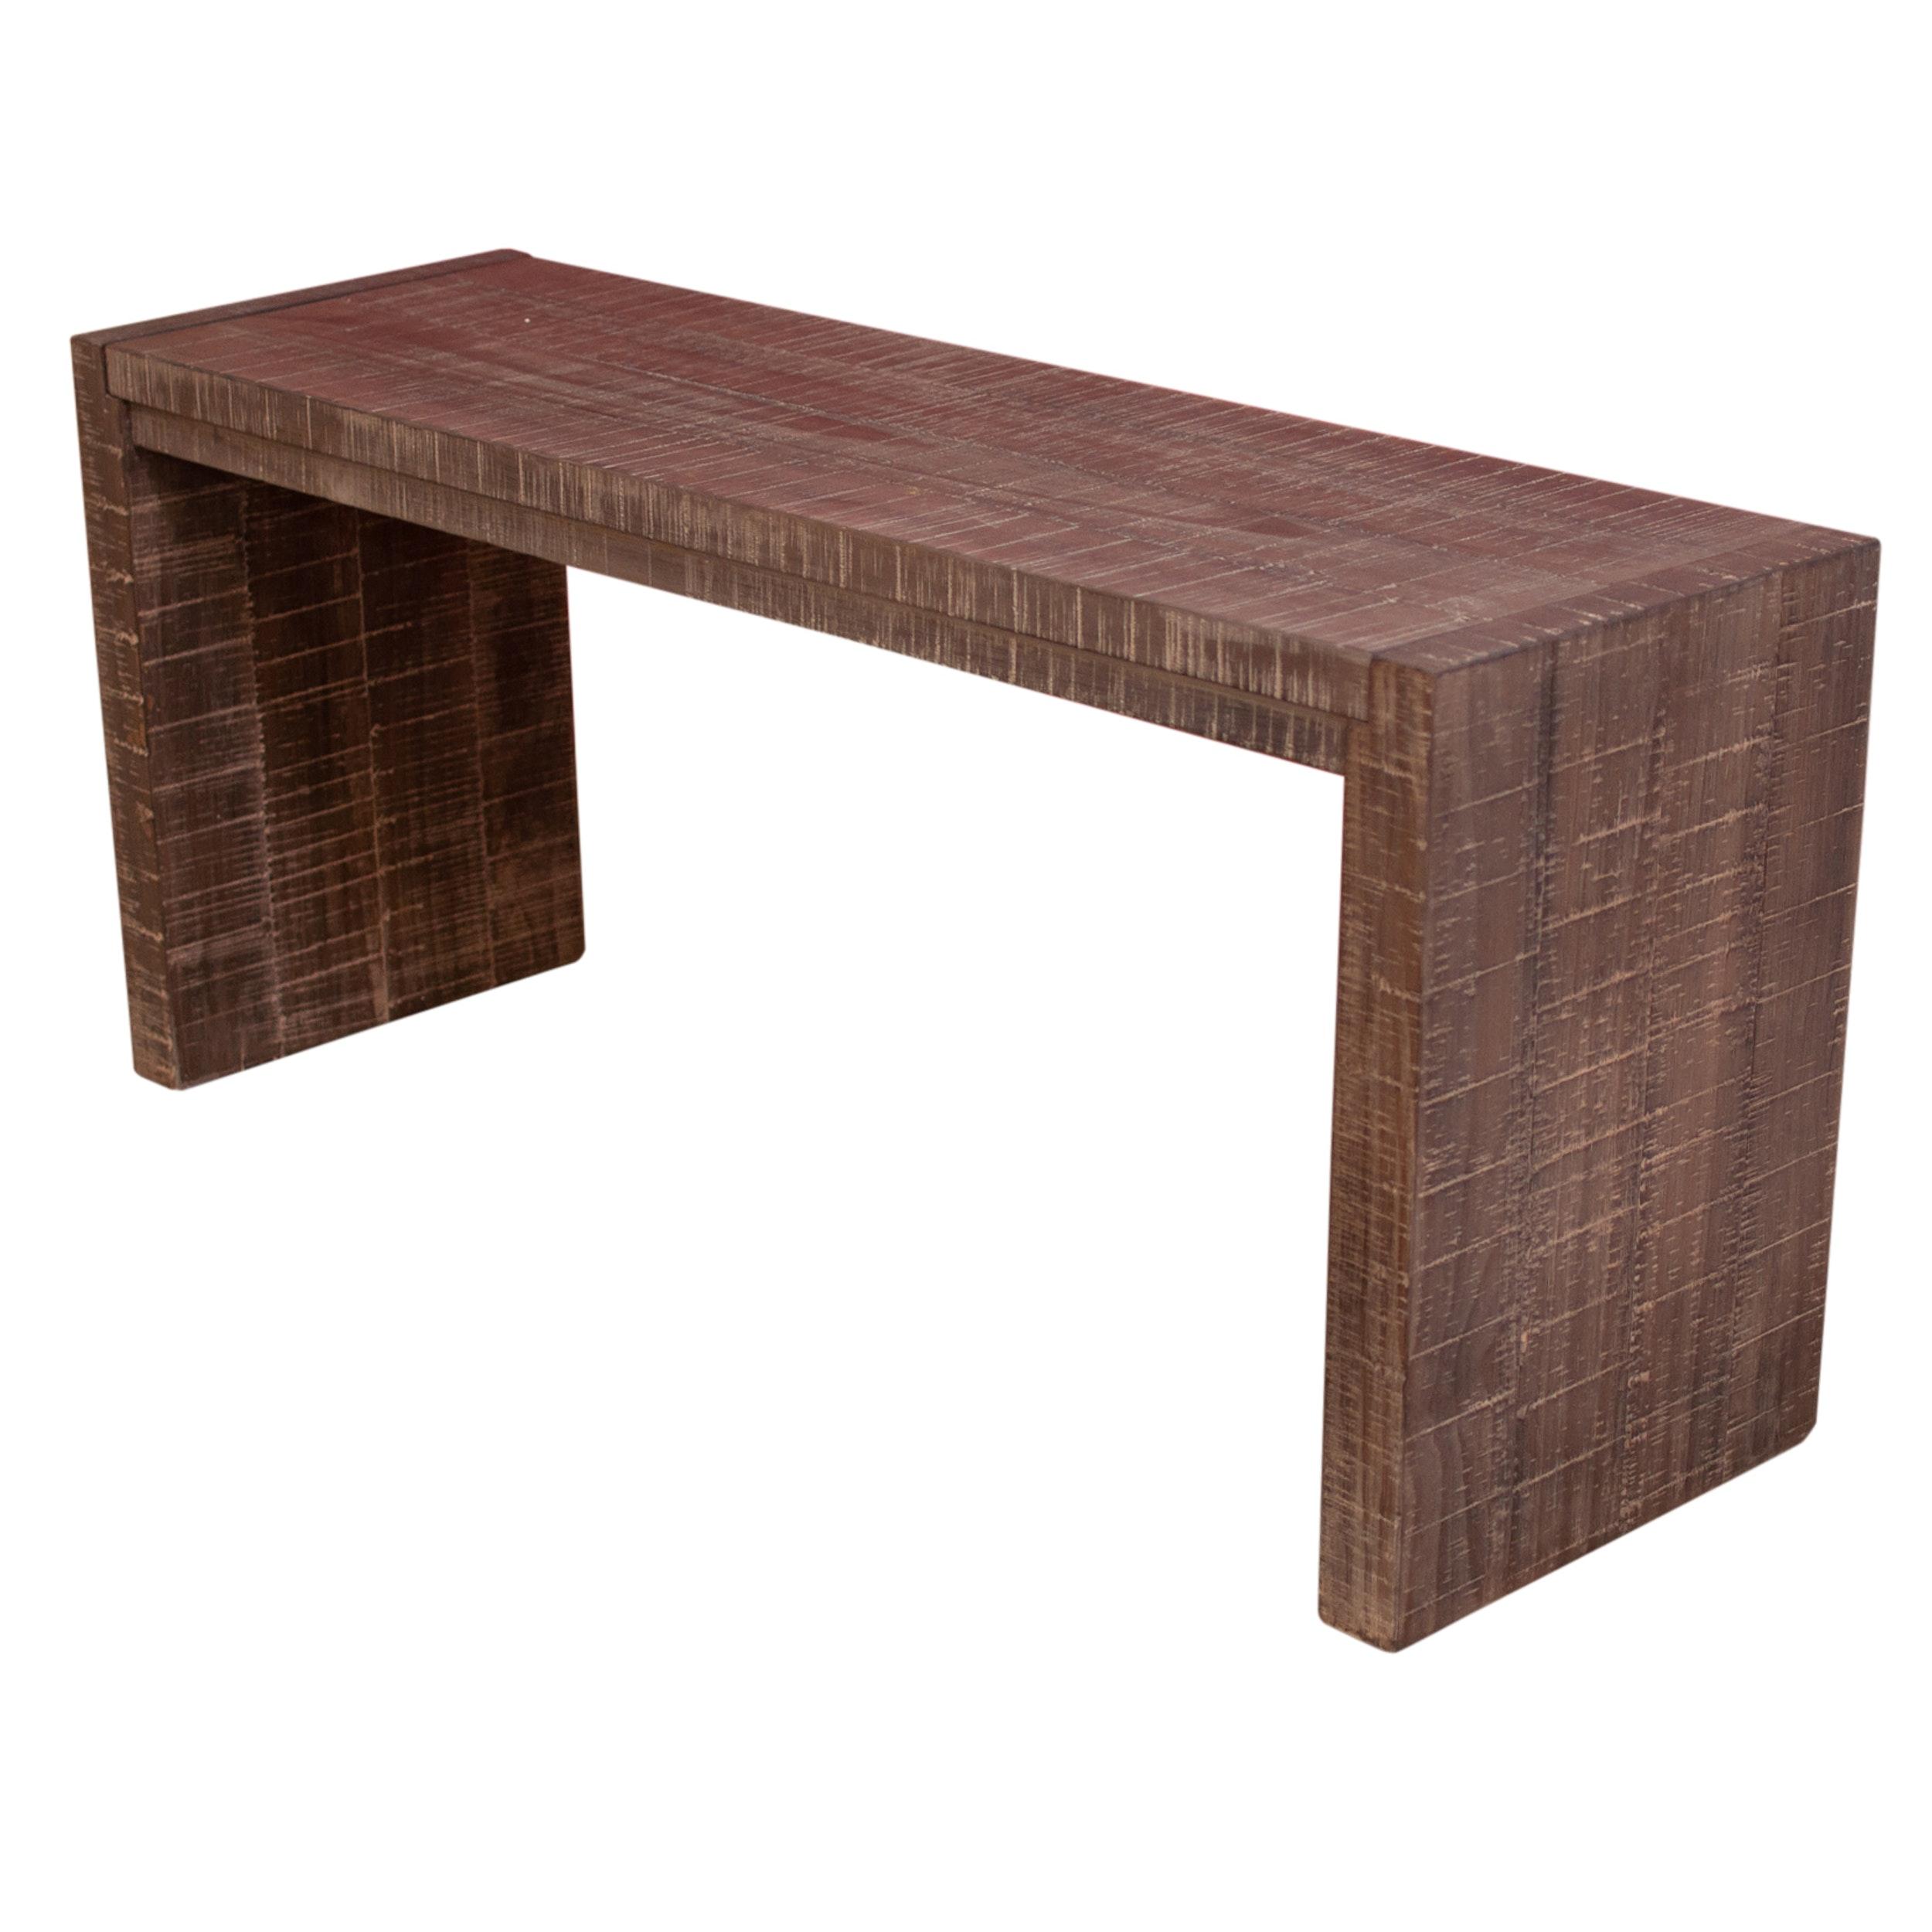 Emerald Home Wooden Sofa Table, Contemporary